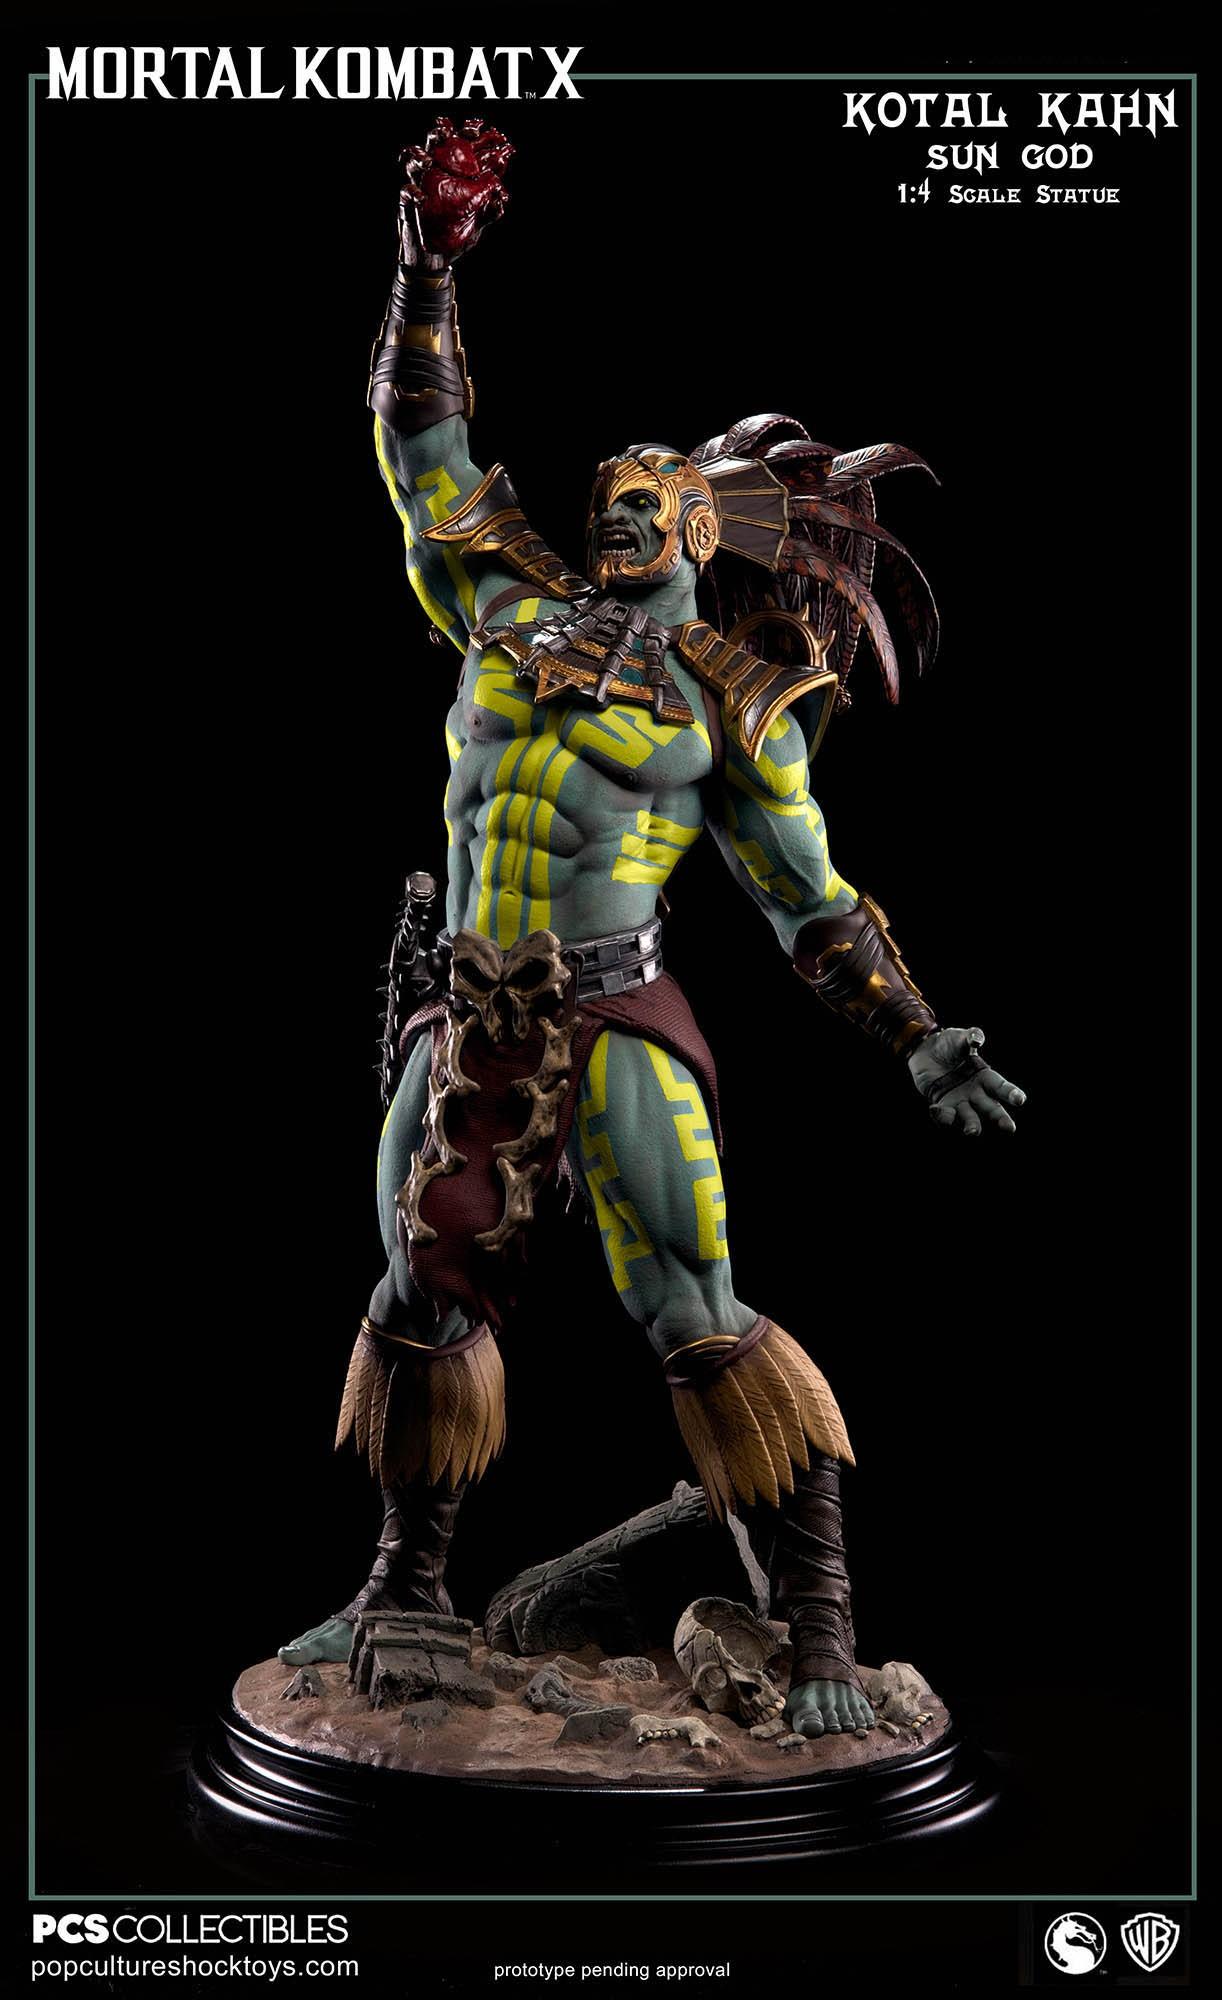 [Pop Culture Shock] Mortal Kombat X: Kotal Kahn 1:4 scale PCS-Kotal-Kahn-Sun-God-006